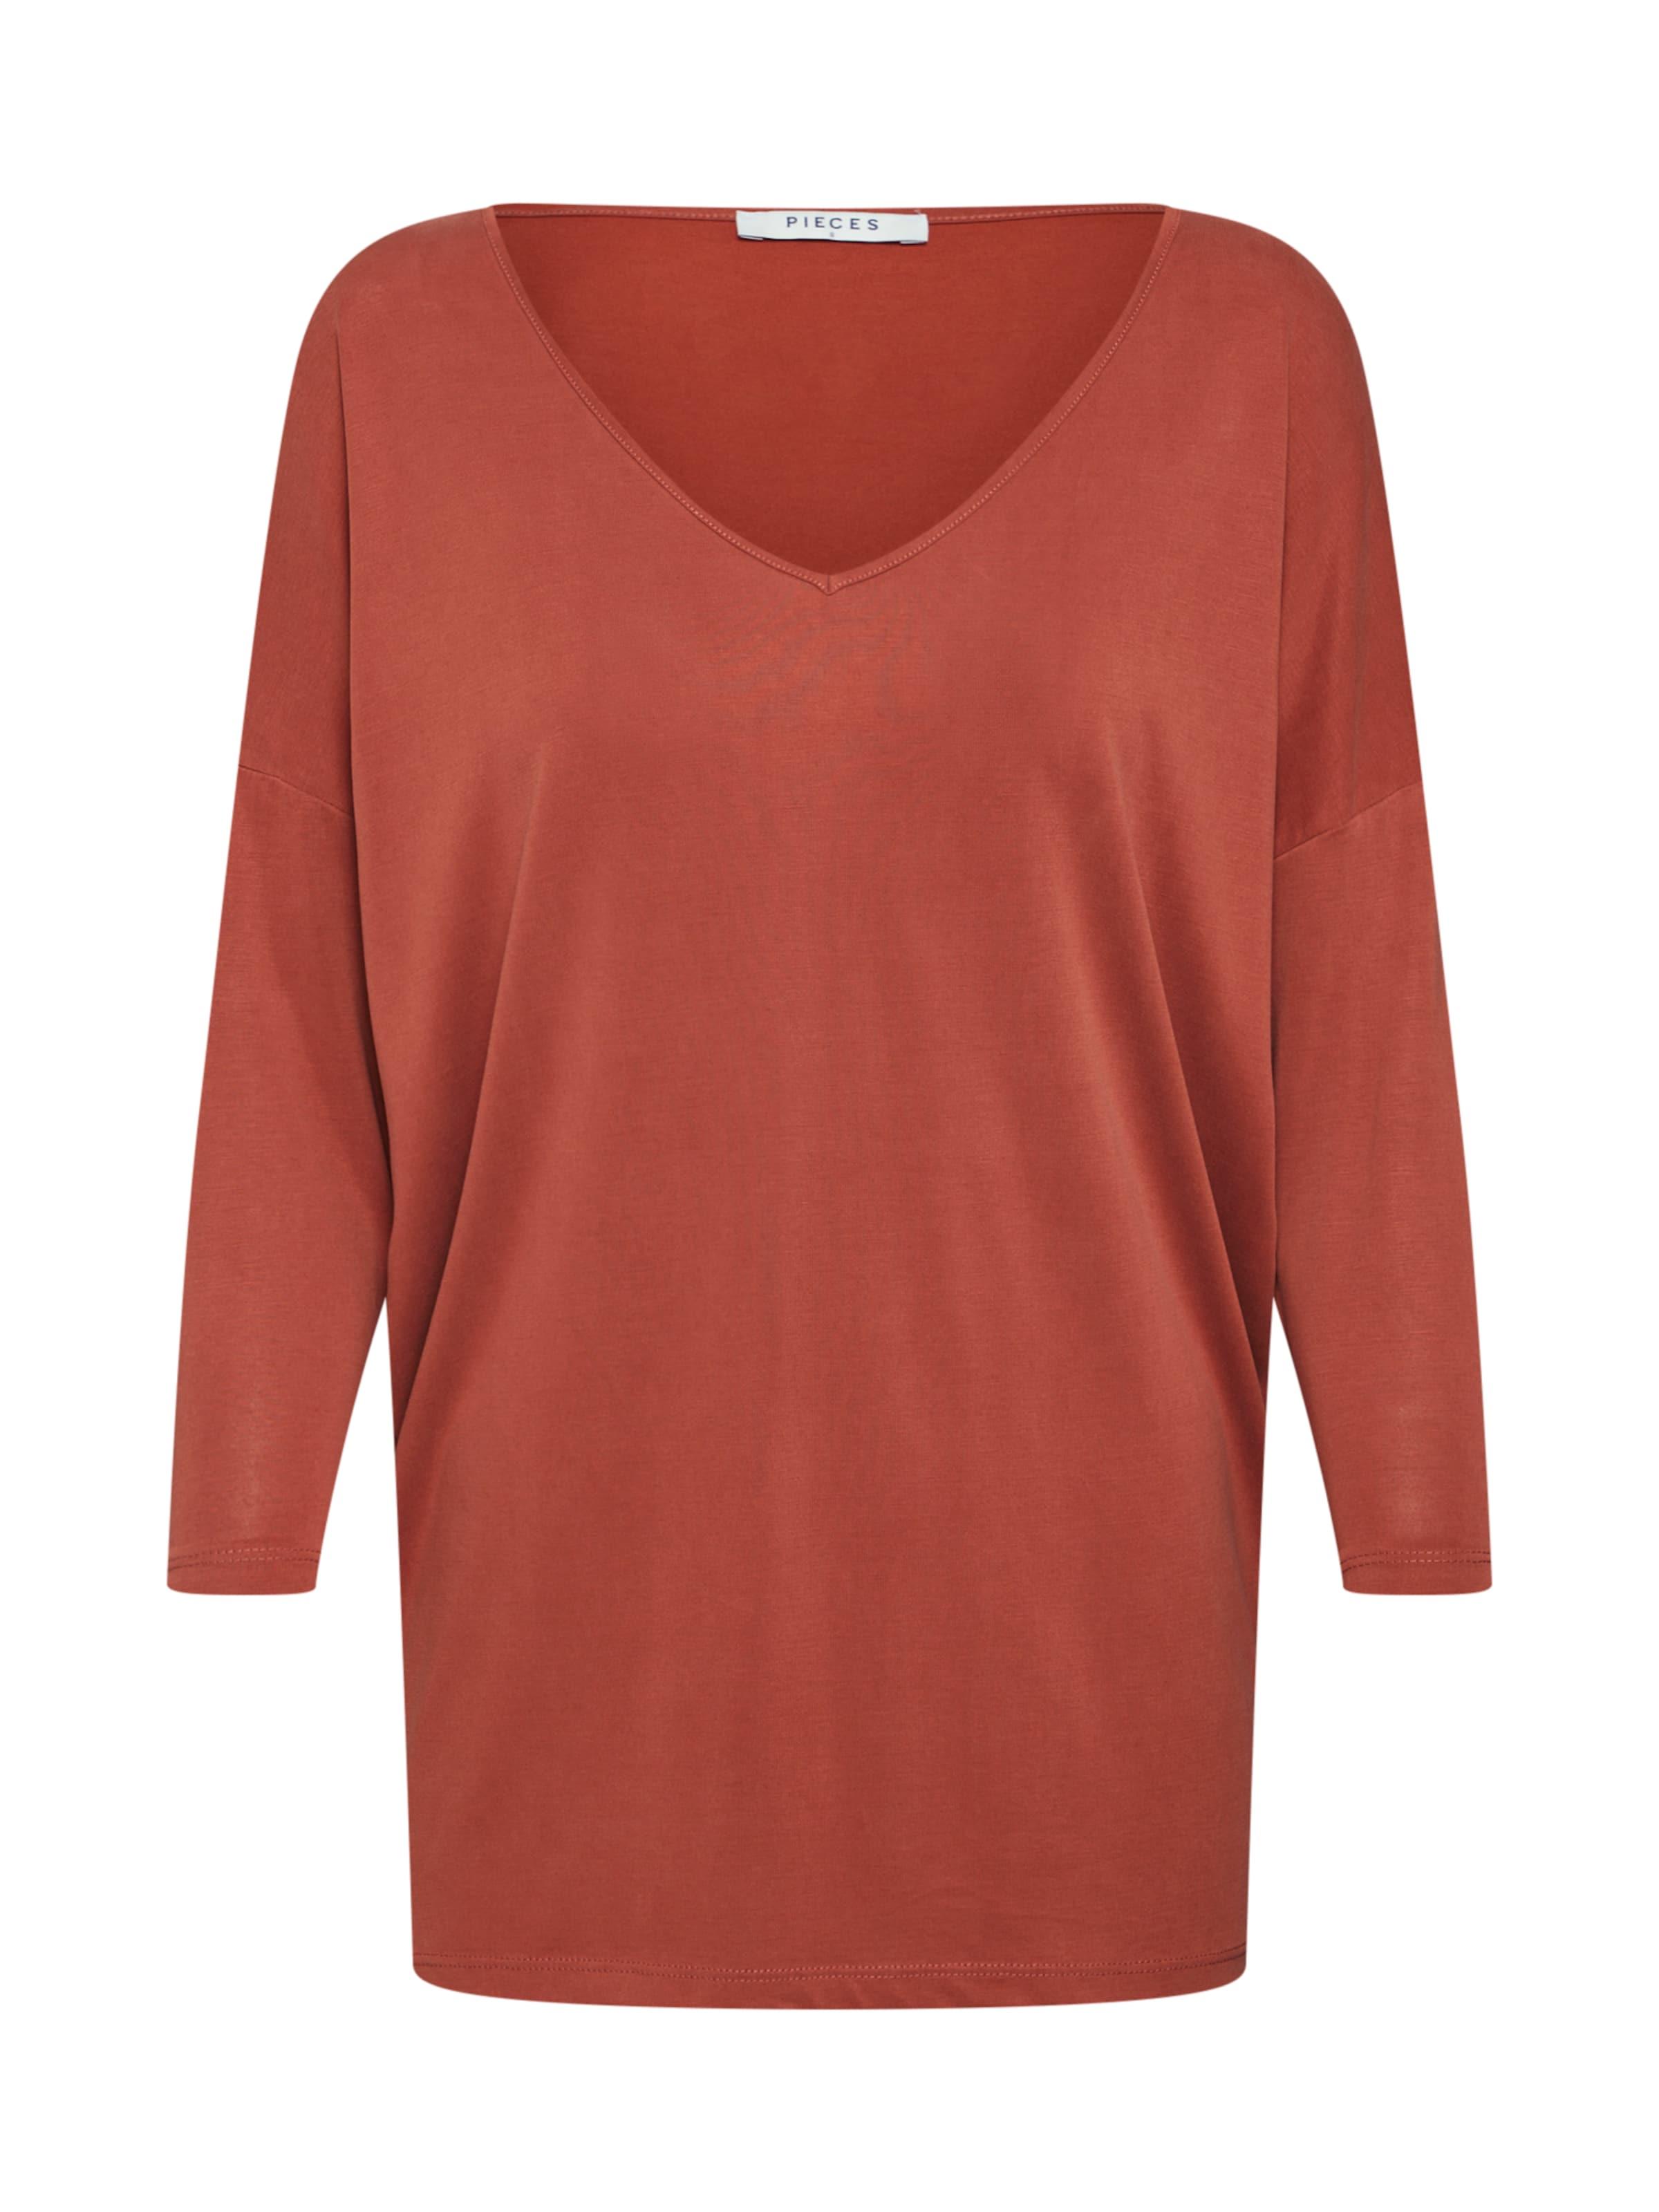 'kamala' Pieces Pieces 'kamala' Shirt Rostrot Shirt In wv8OmNn0